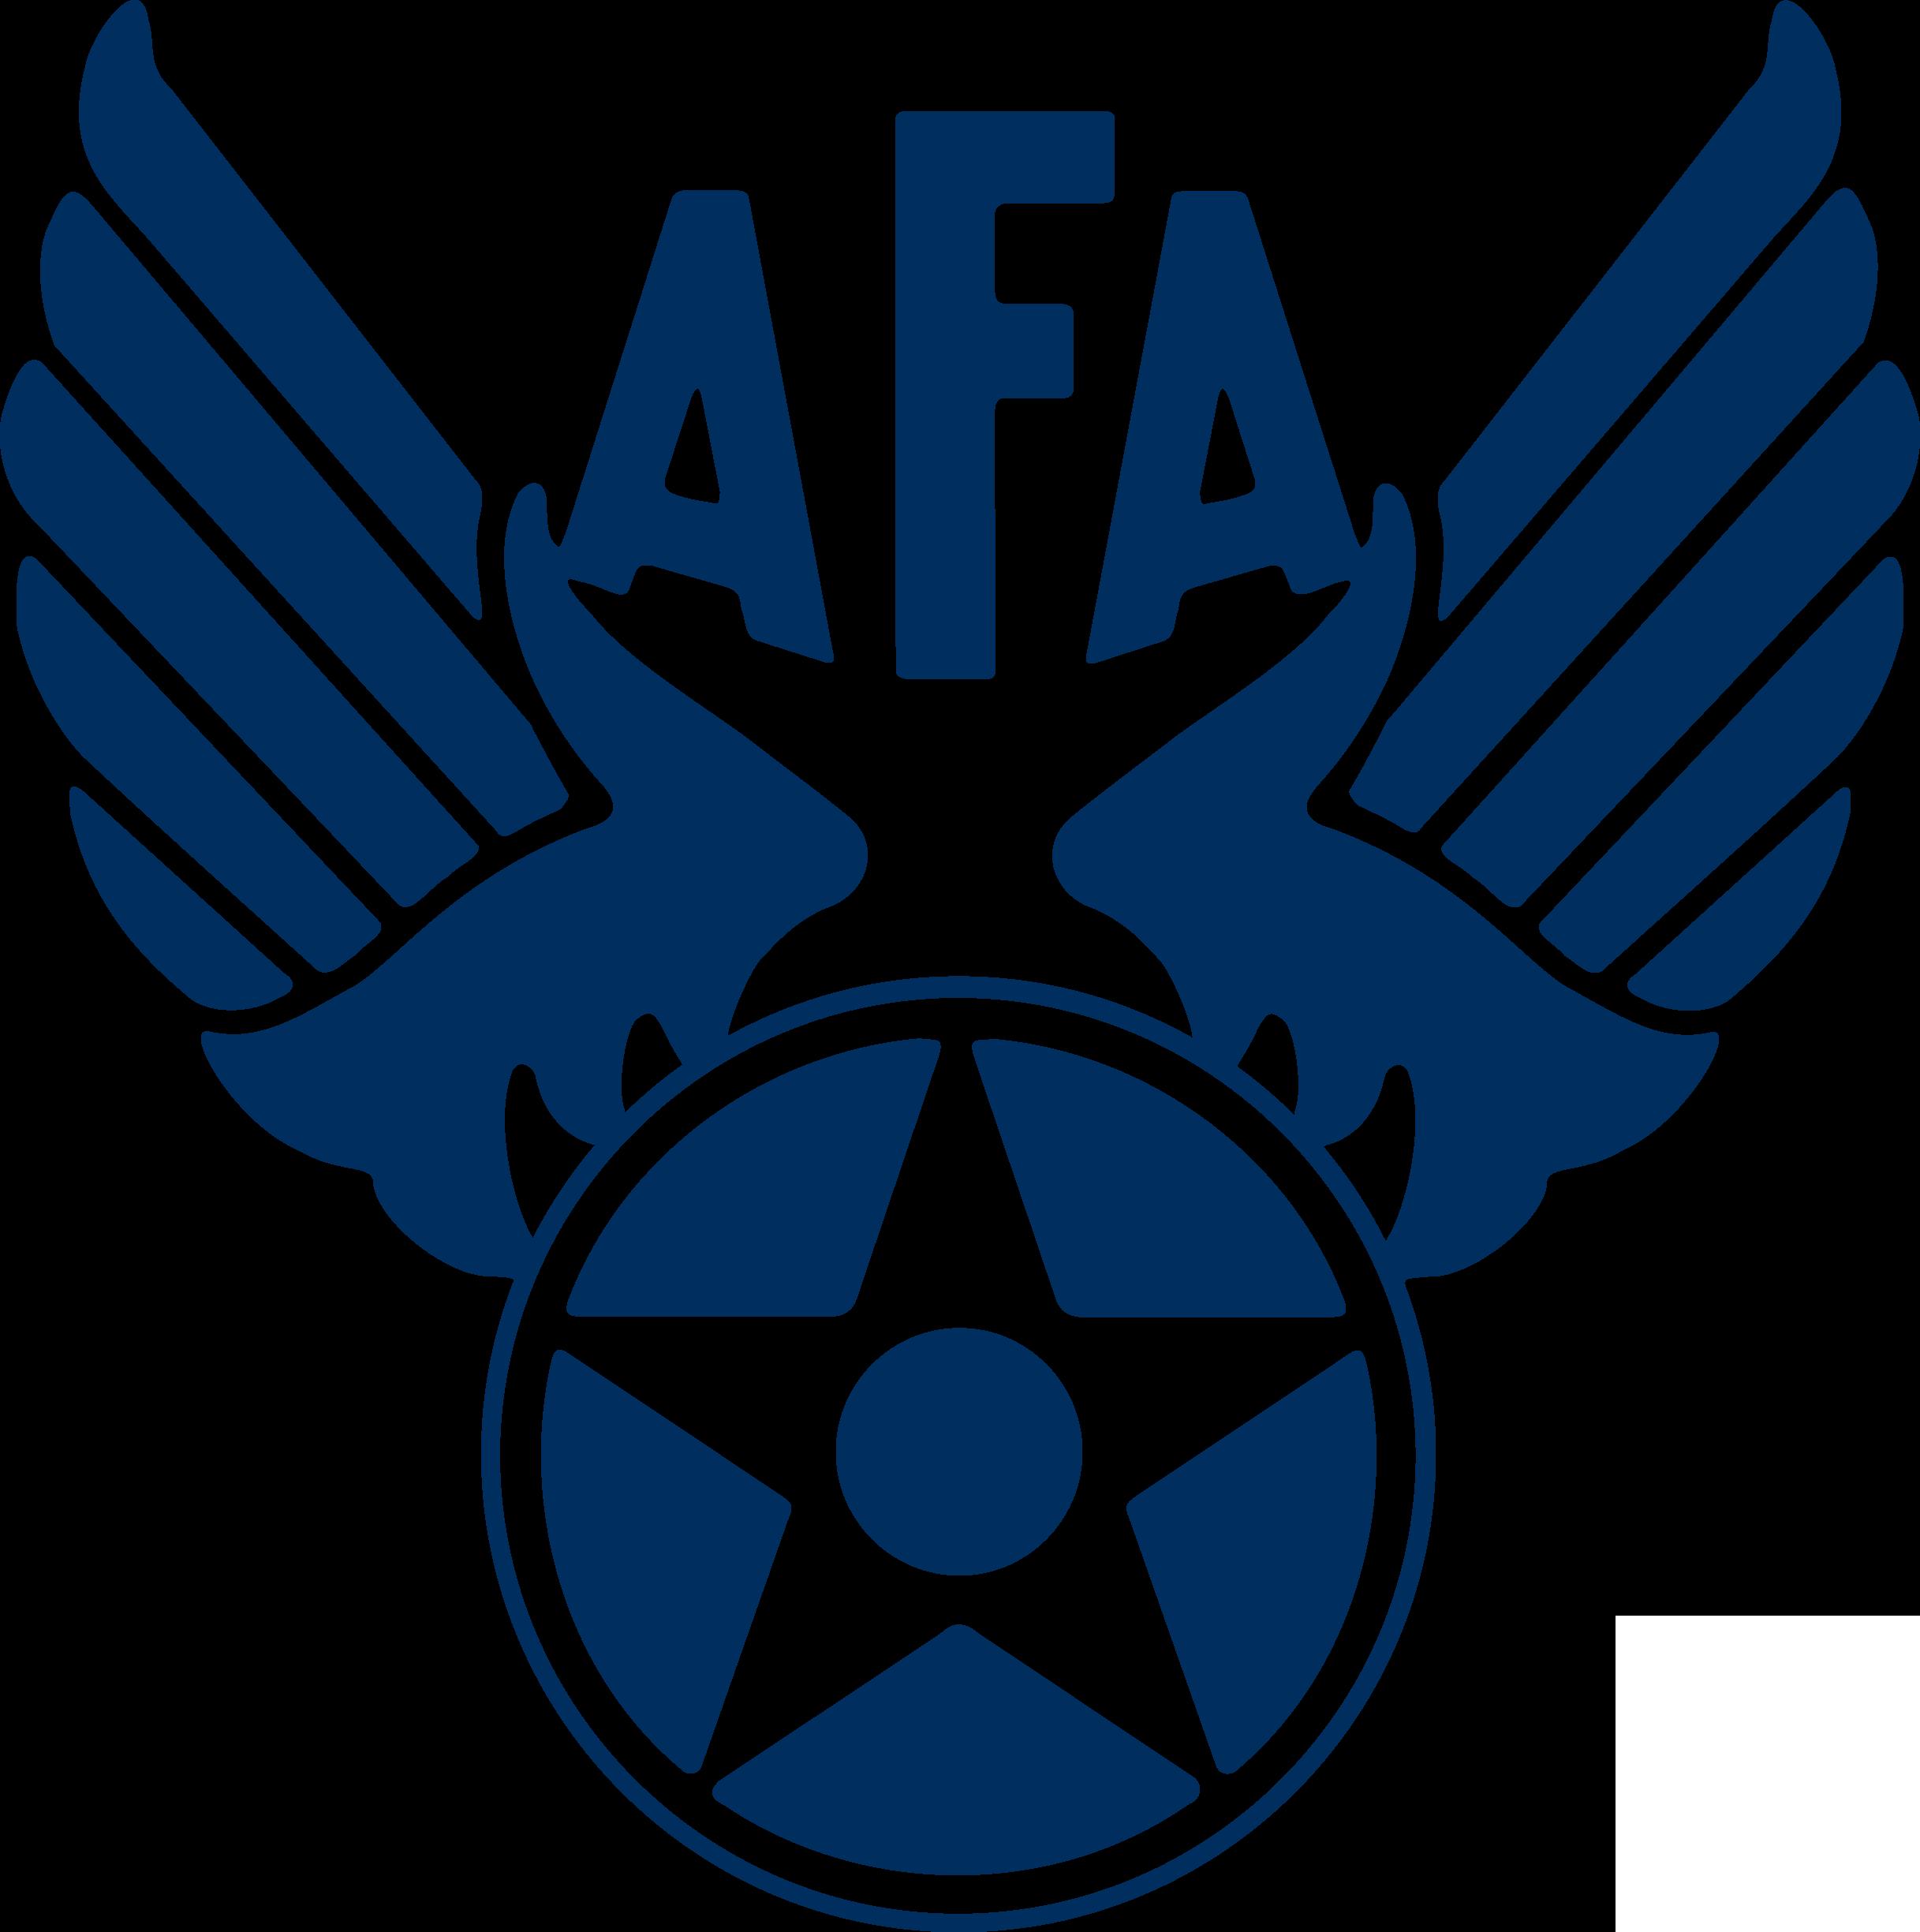 Afa Team Logo PNG - 97242